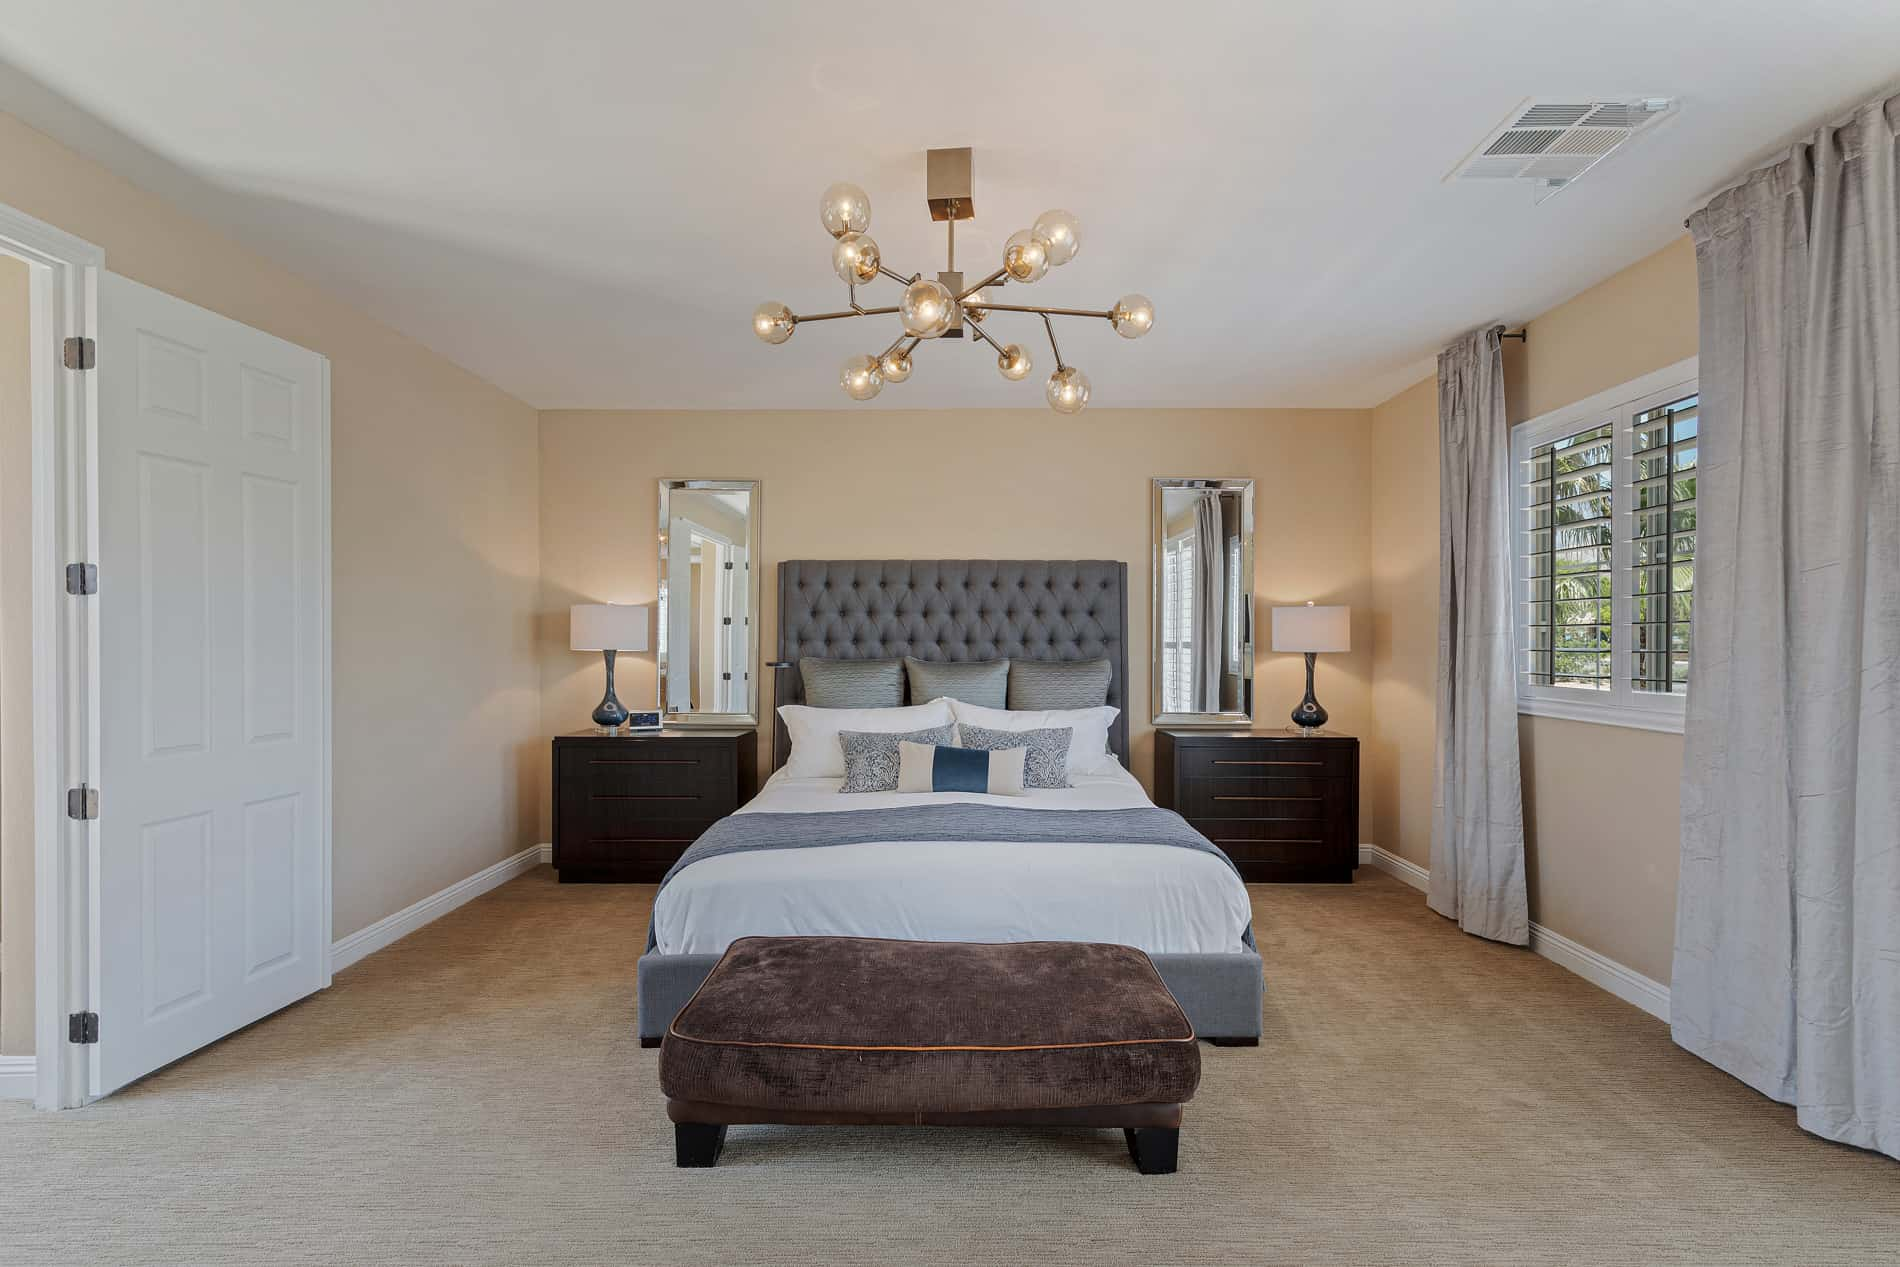 las-vegas-luxry-real-estate-realtor-rob-jensen-company-12108-vista-linda-avenue-the-paseos040